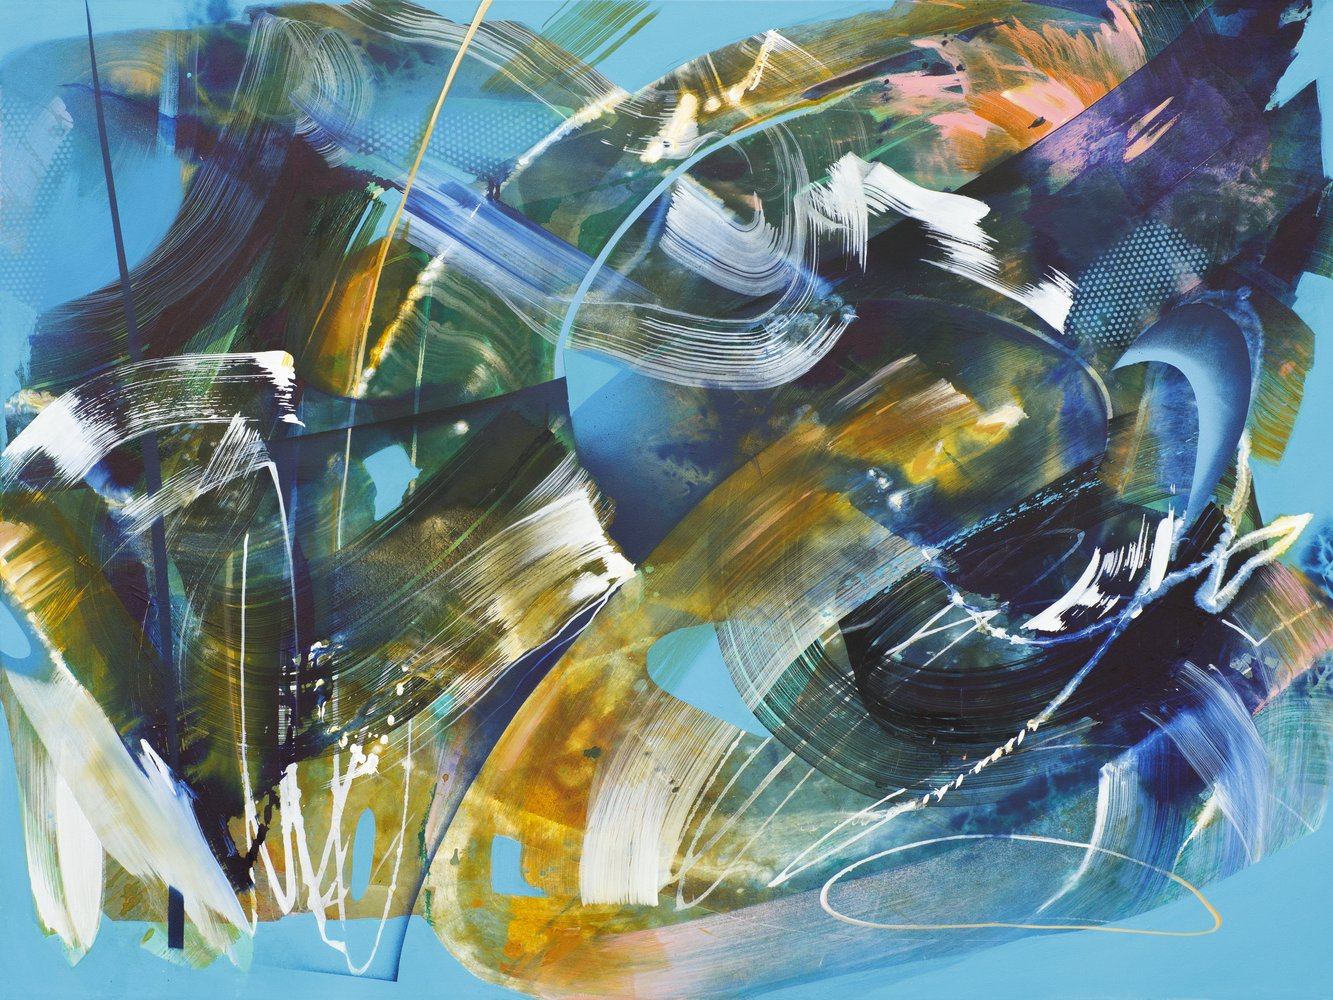 Julia Benz | Storm, acrylic, spraypaint on canvas, 120 x 160 cm, 2021